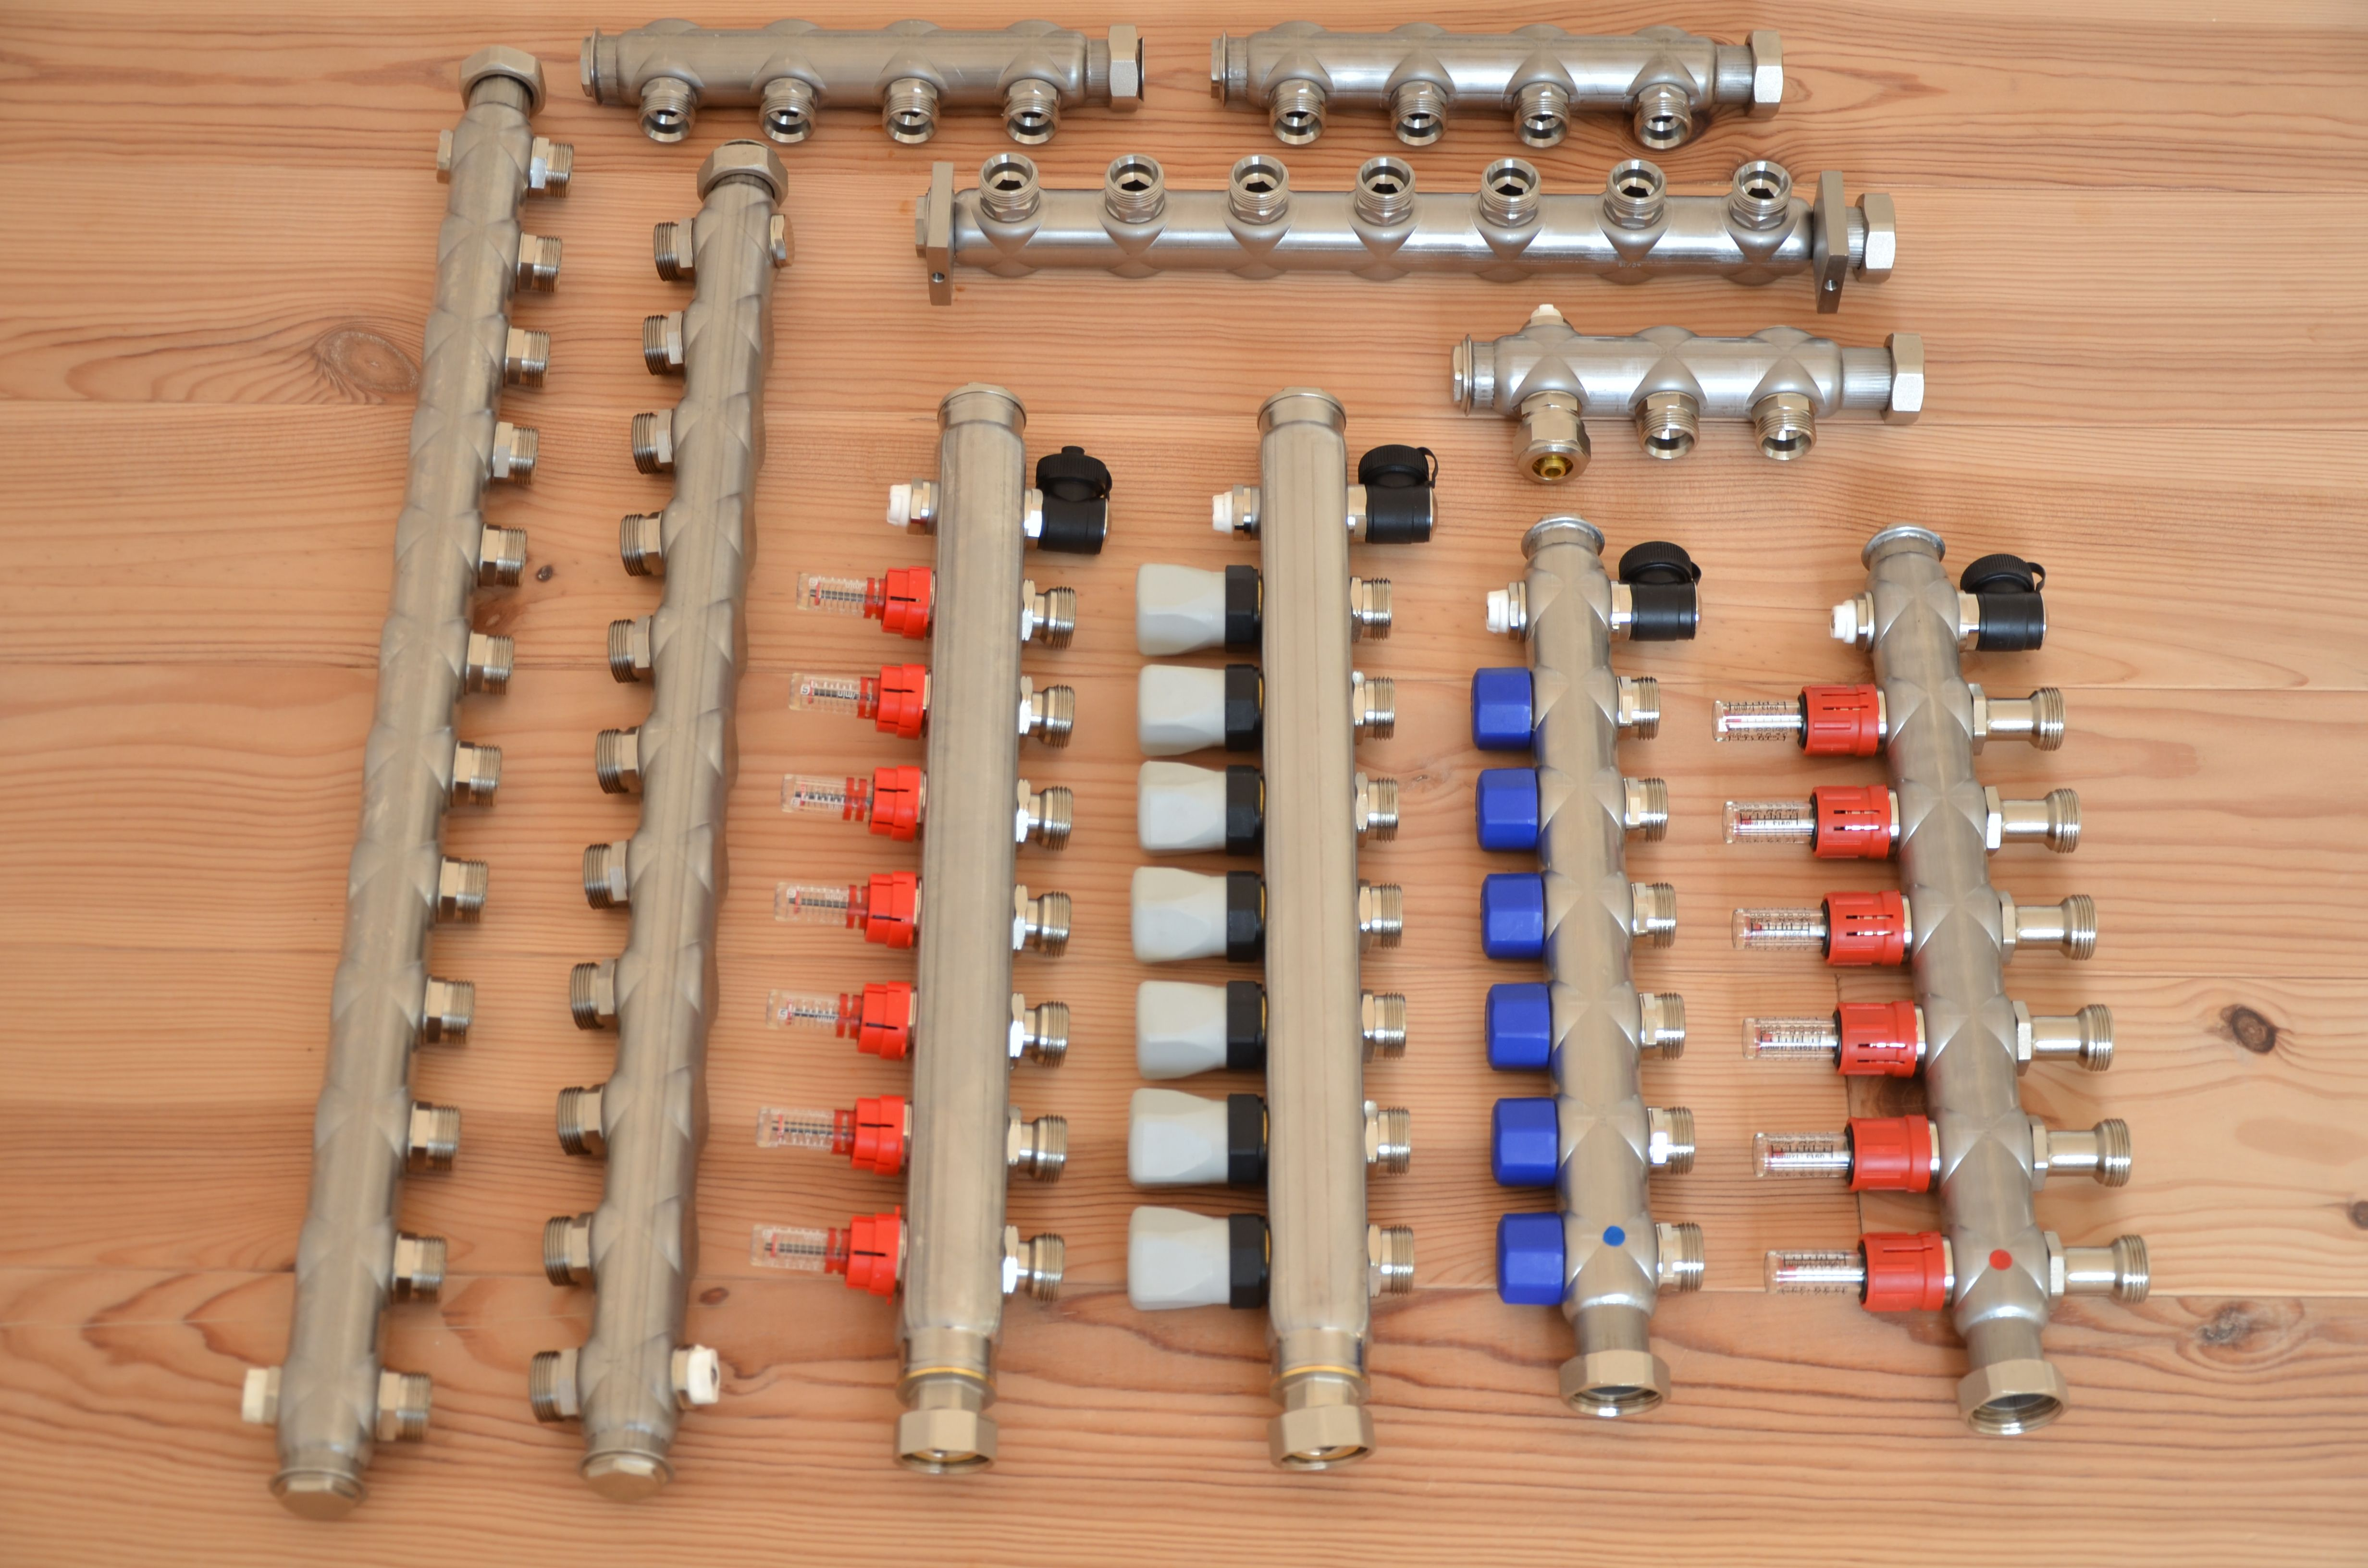 Pin de Electric Woodamps em Manifolds